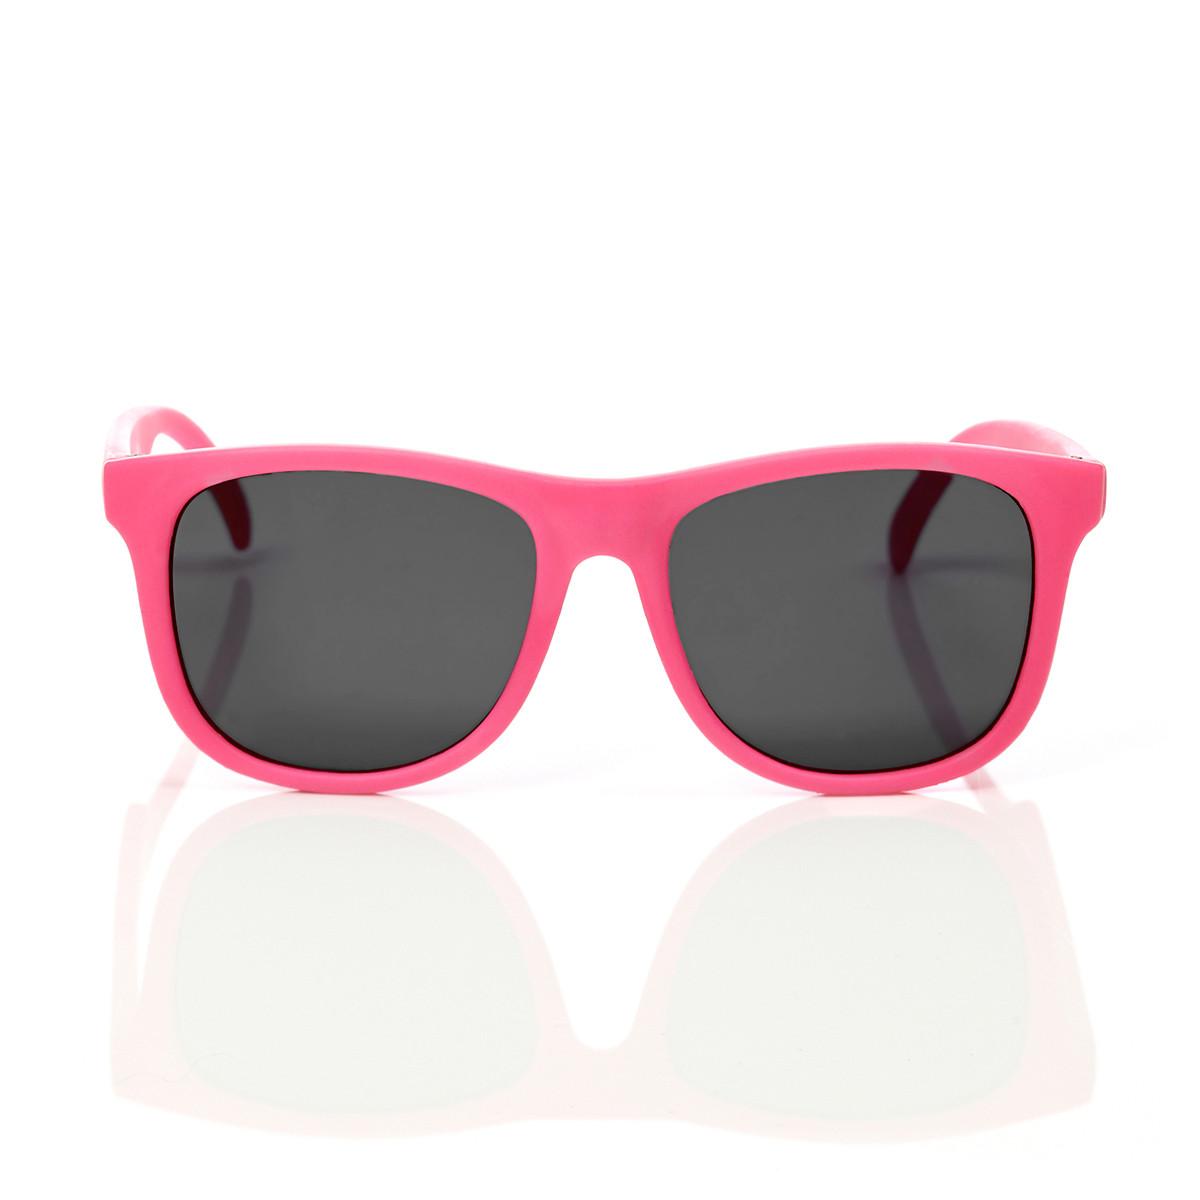 Mustachifier Pink Sunglasses Age 3-6 แว่นกันแดดเด็กสีชมพู